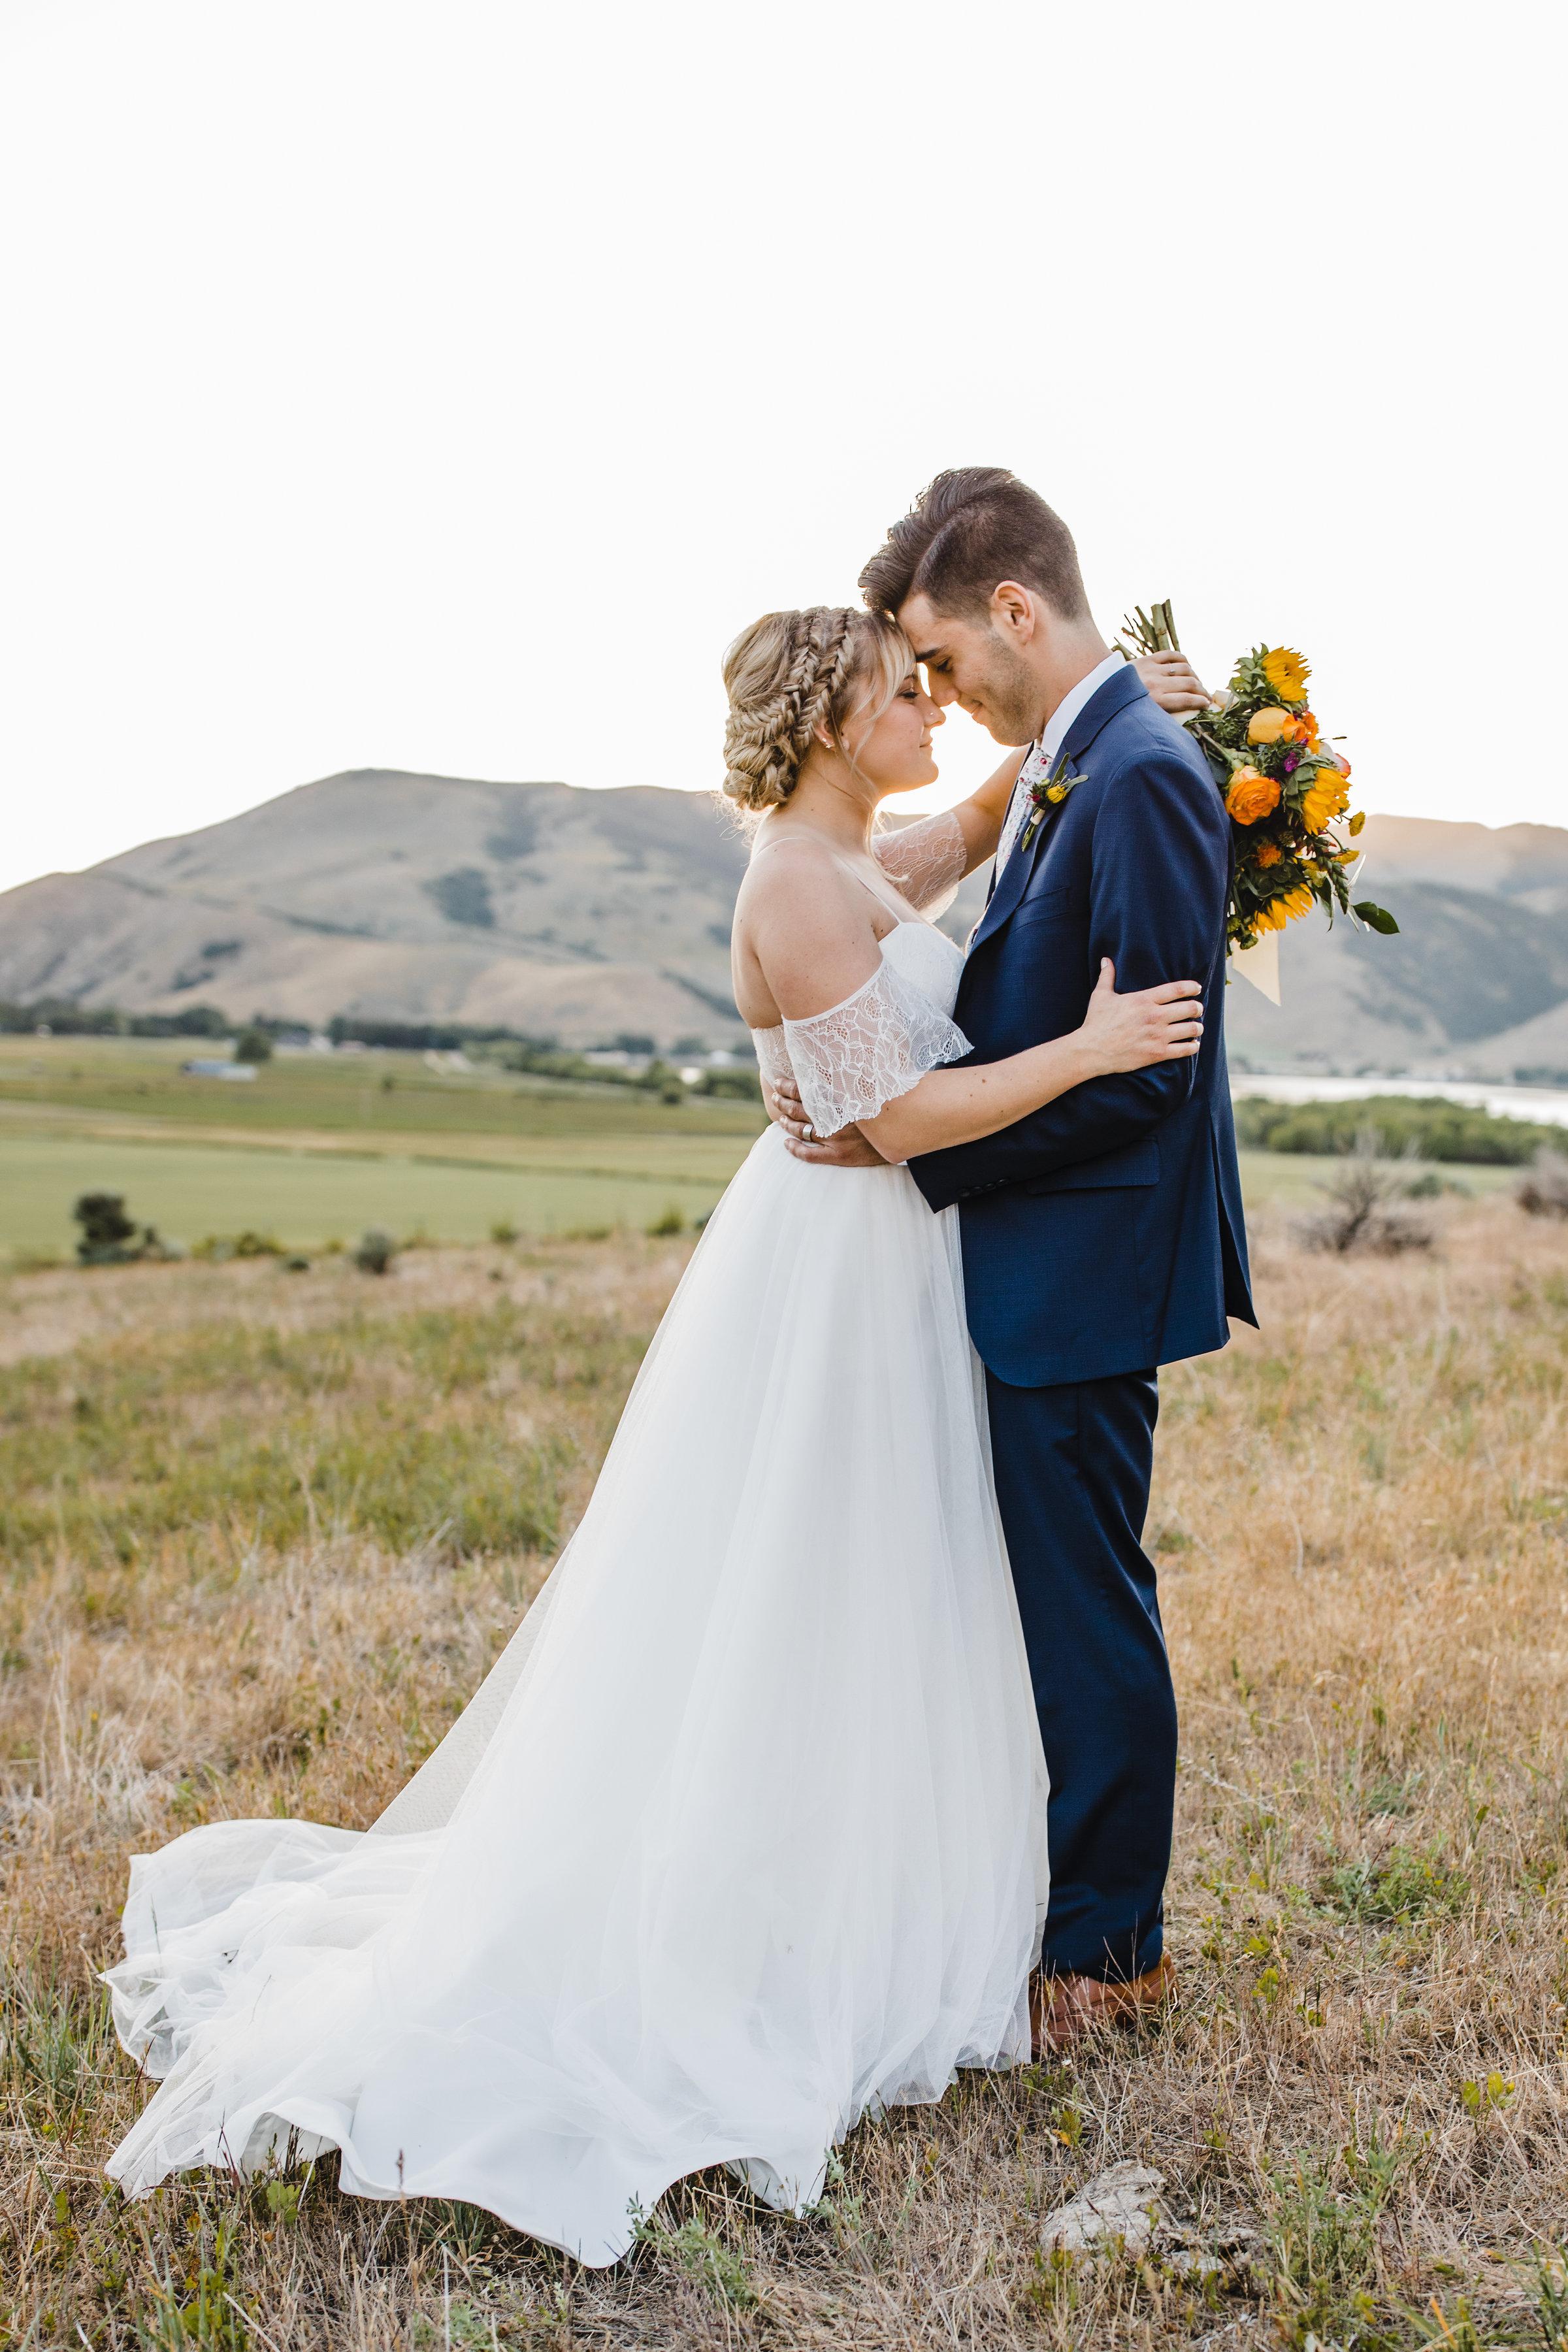 best wedding photographer in cache valley utah logan utah wedding braids bohemian bride dress kissing